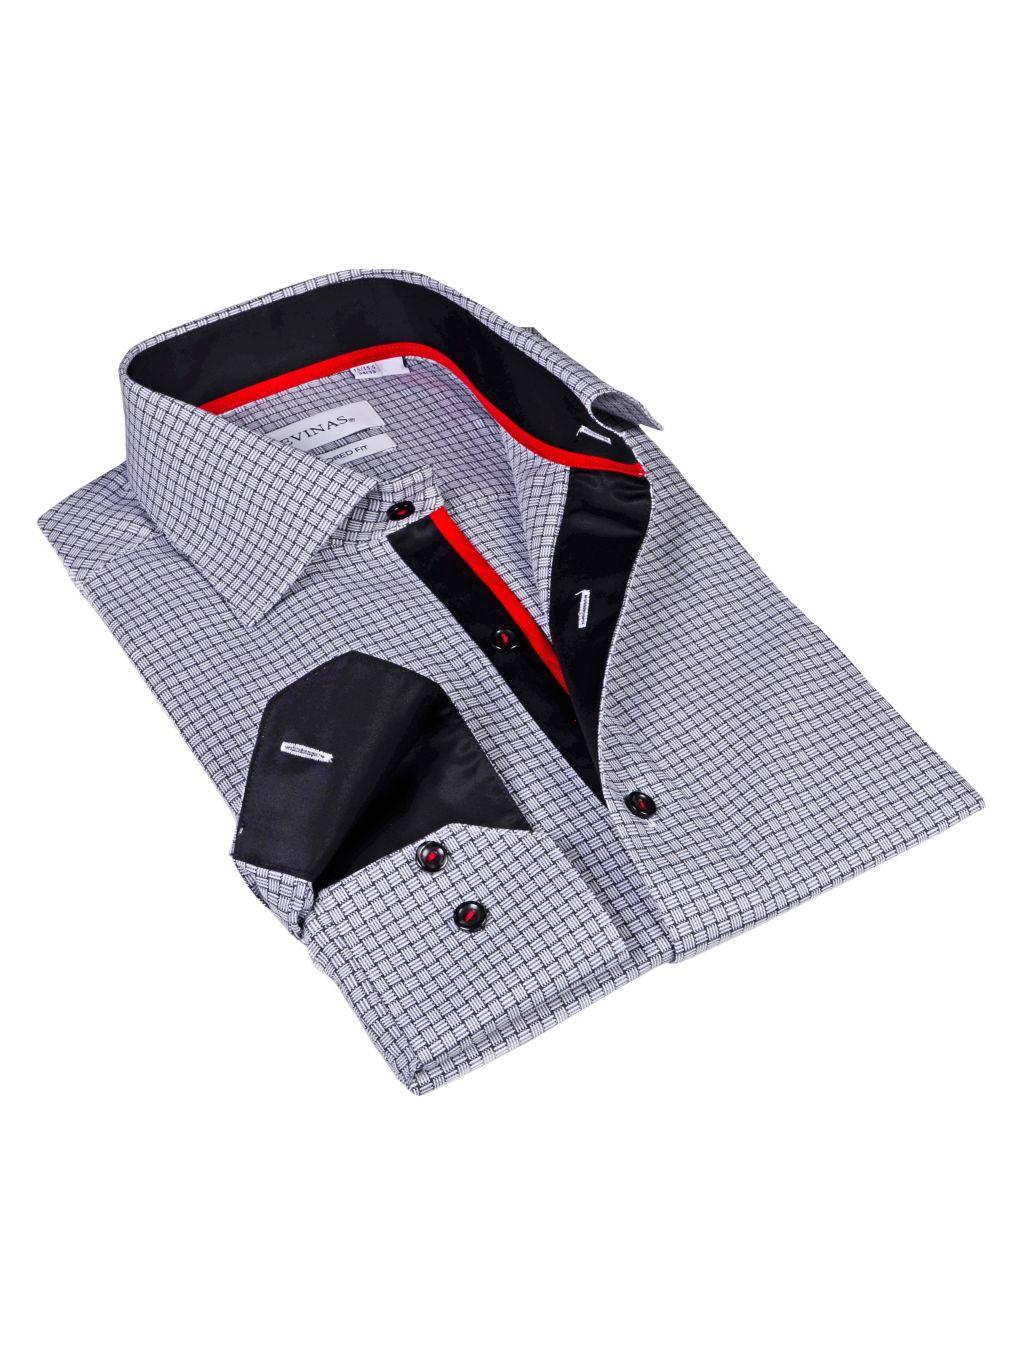 Levinas Tailored-Fit Grid-Print Dress Shirt